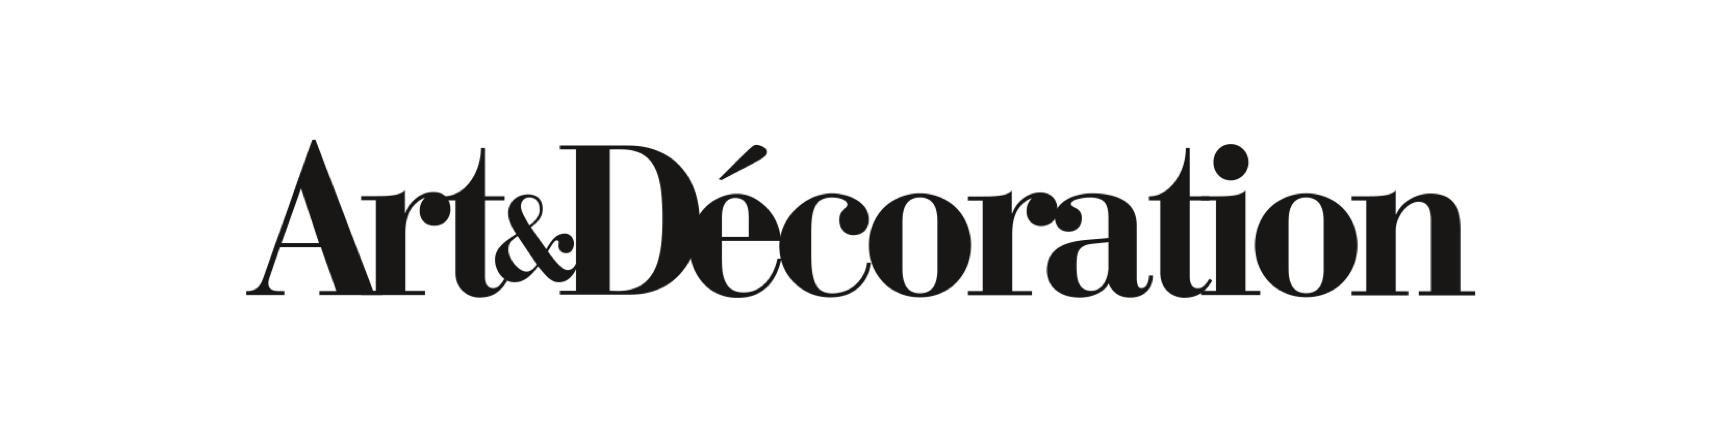 logo-art-&-decoration.png